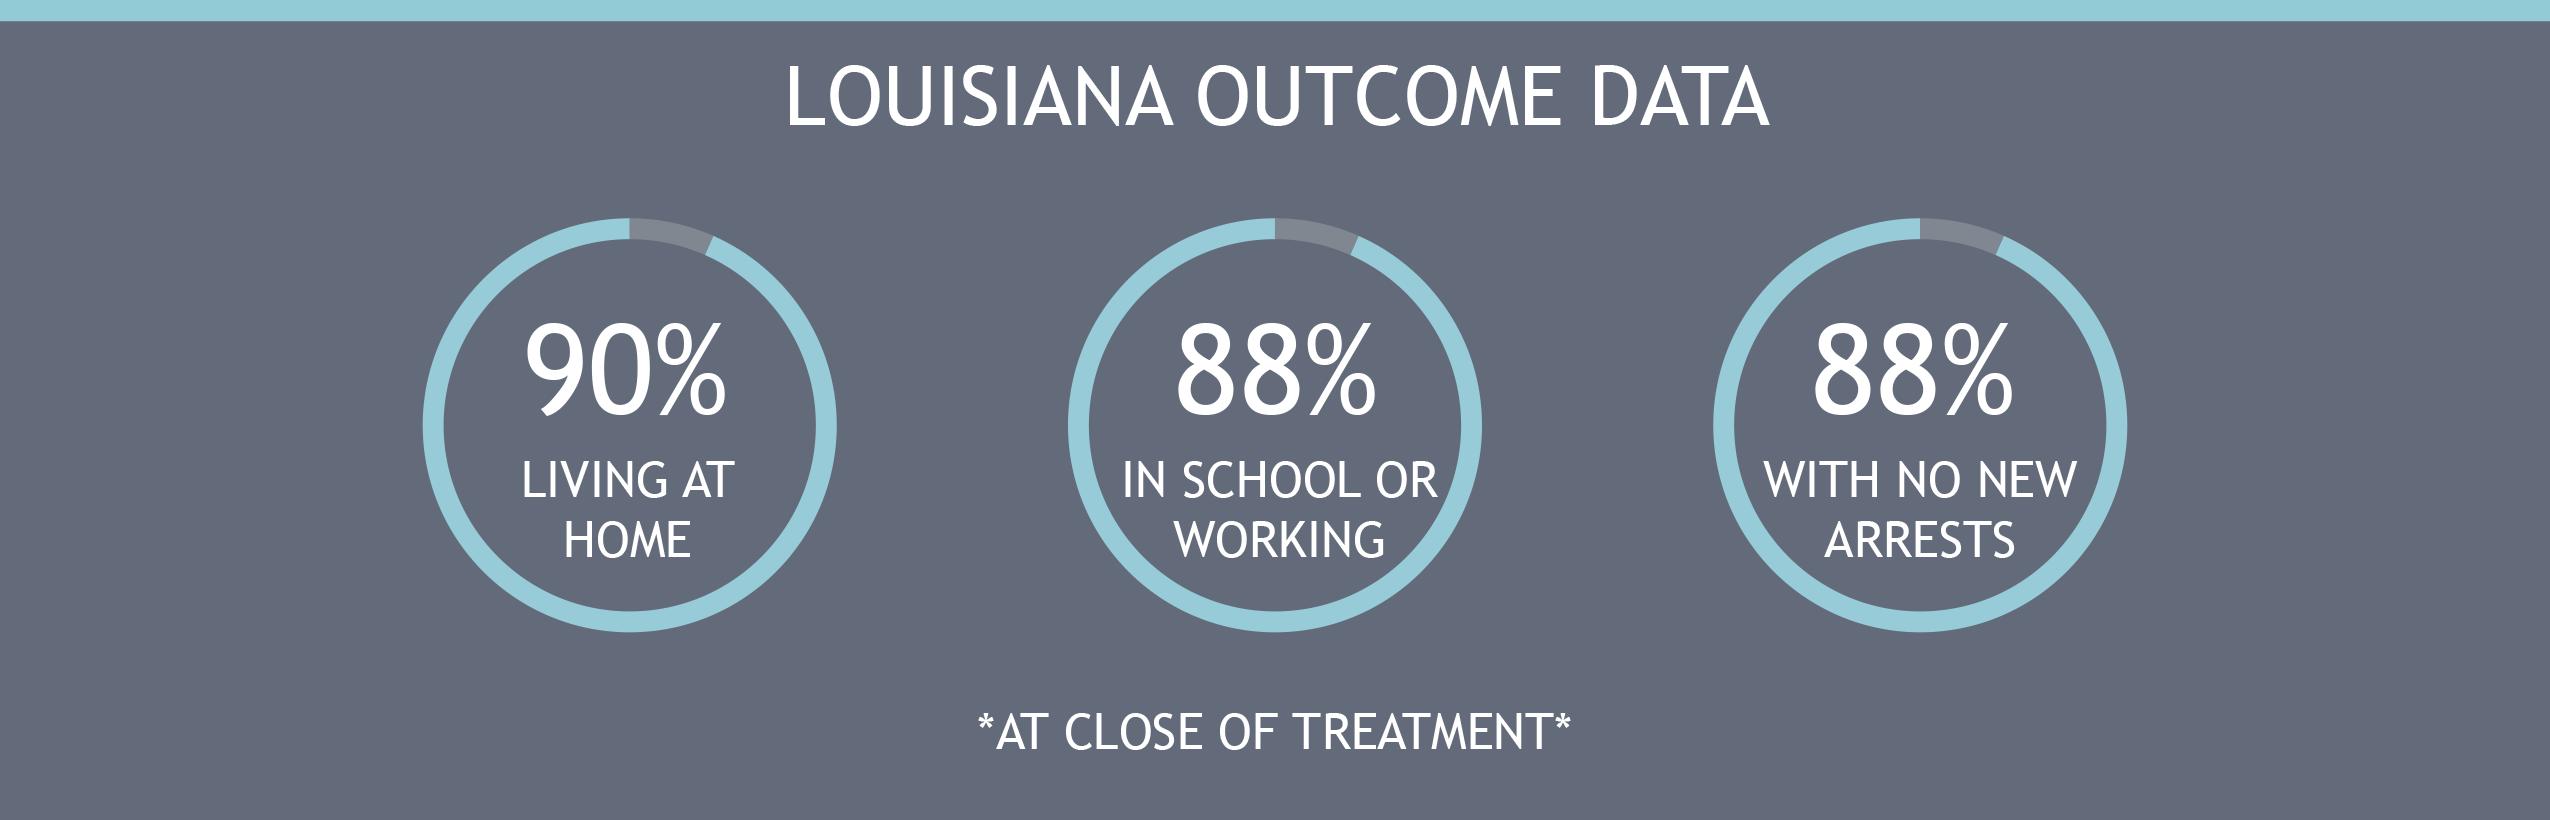 Louisiana outcome data